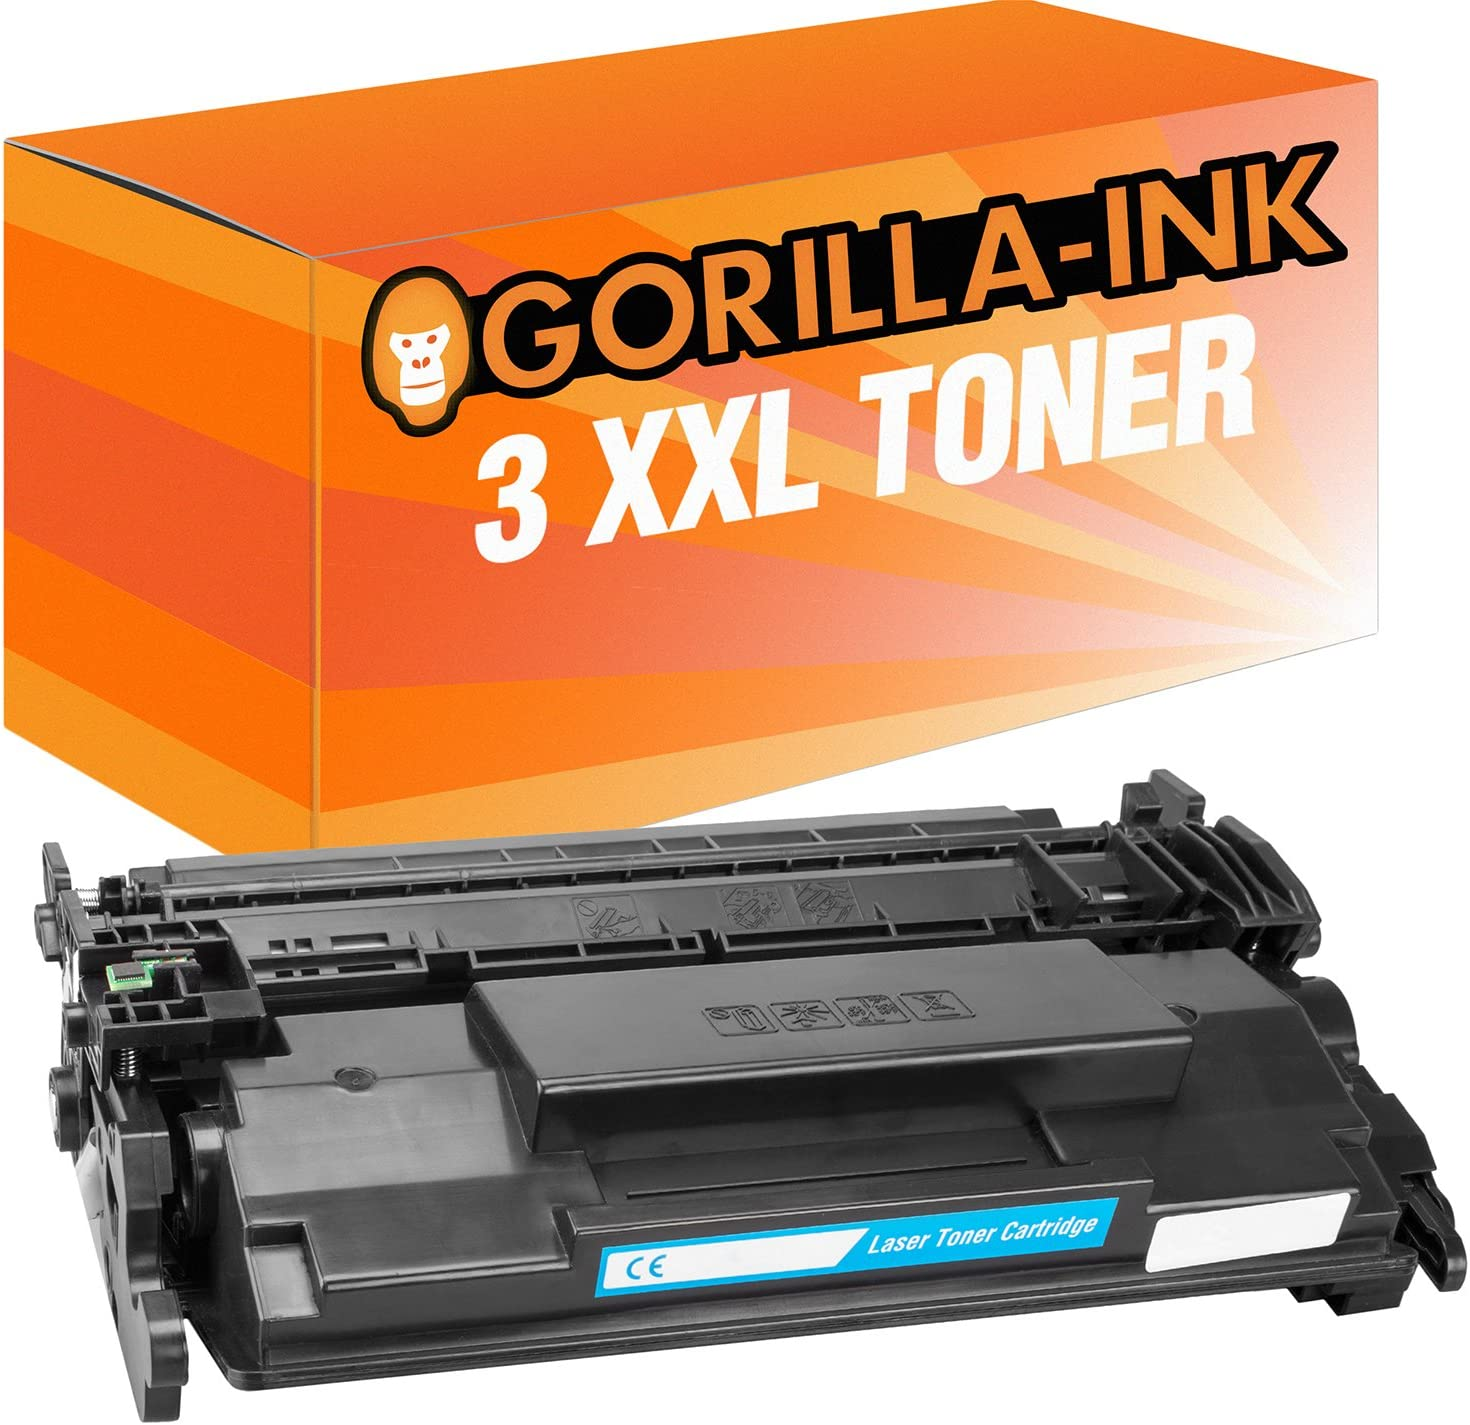 Gorilla de Ink® 3 x Tóner XXL compatible con HP cf226 X LaserJet ...